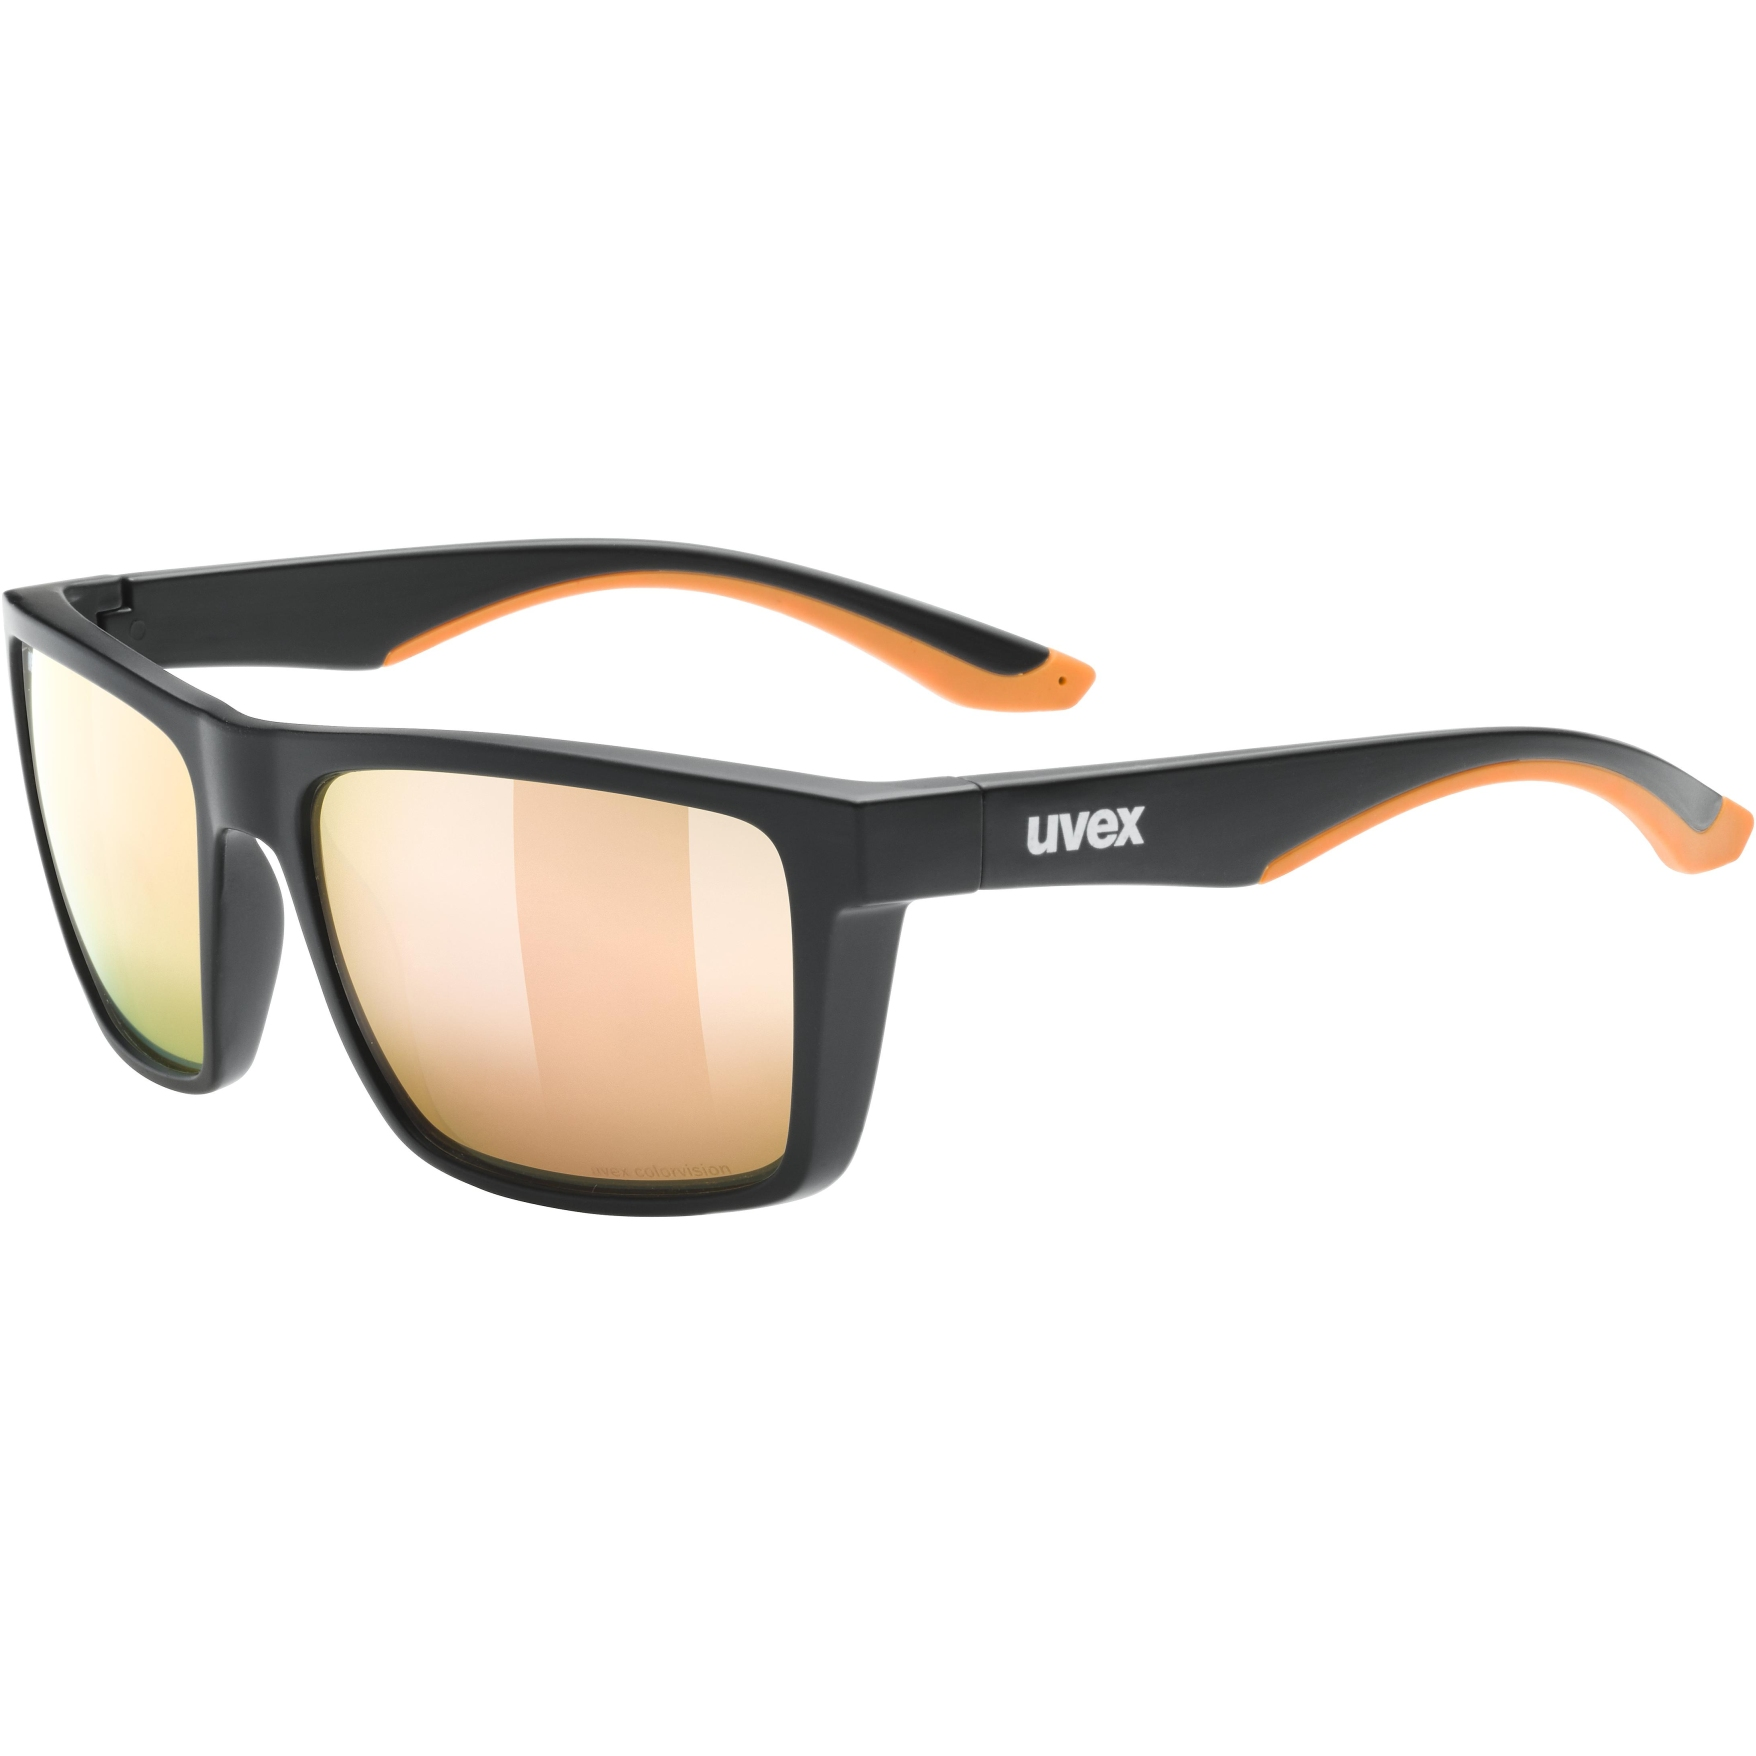 Uvex lgl 50 CV Glasses - black mat/colorvision mirror champagne